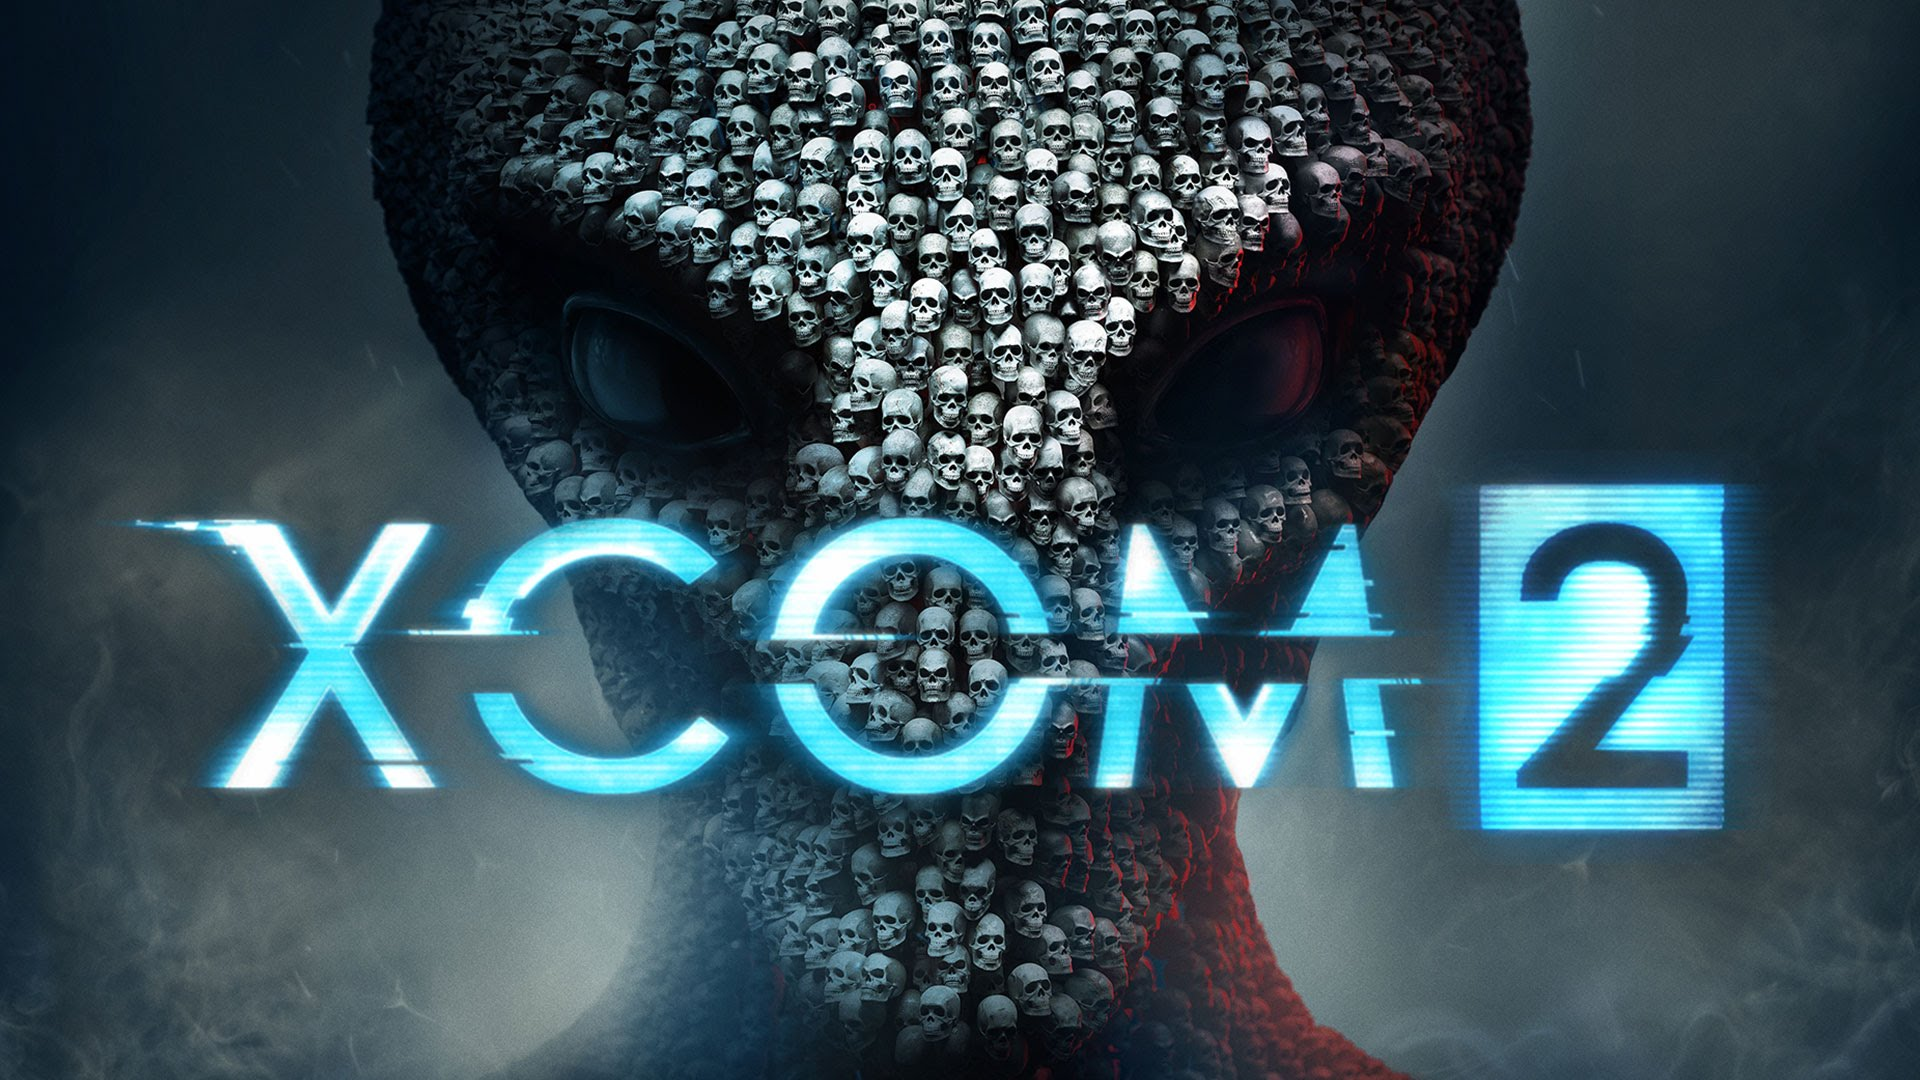 XCOM2 title card.